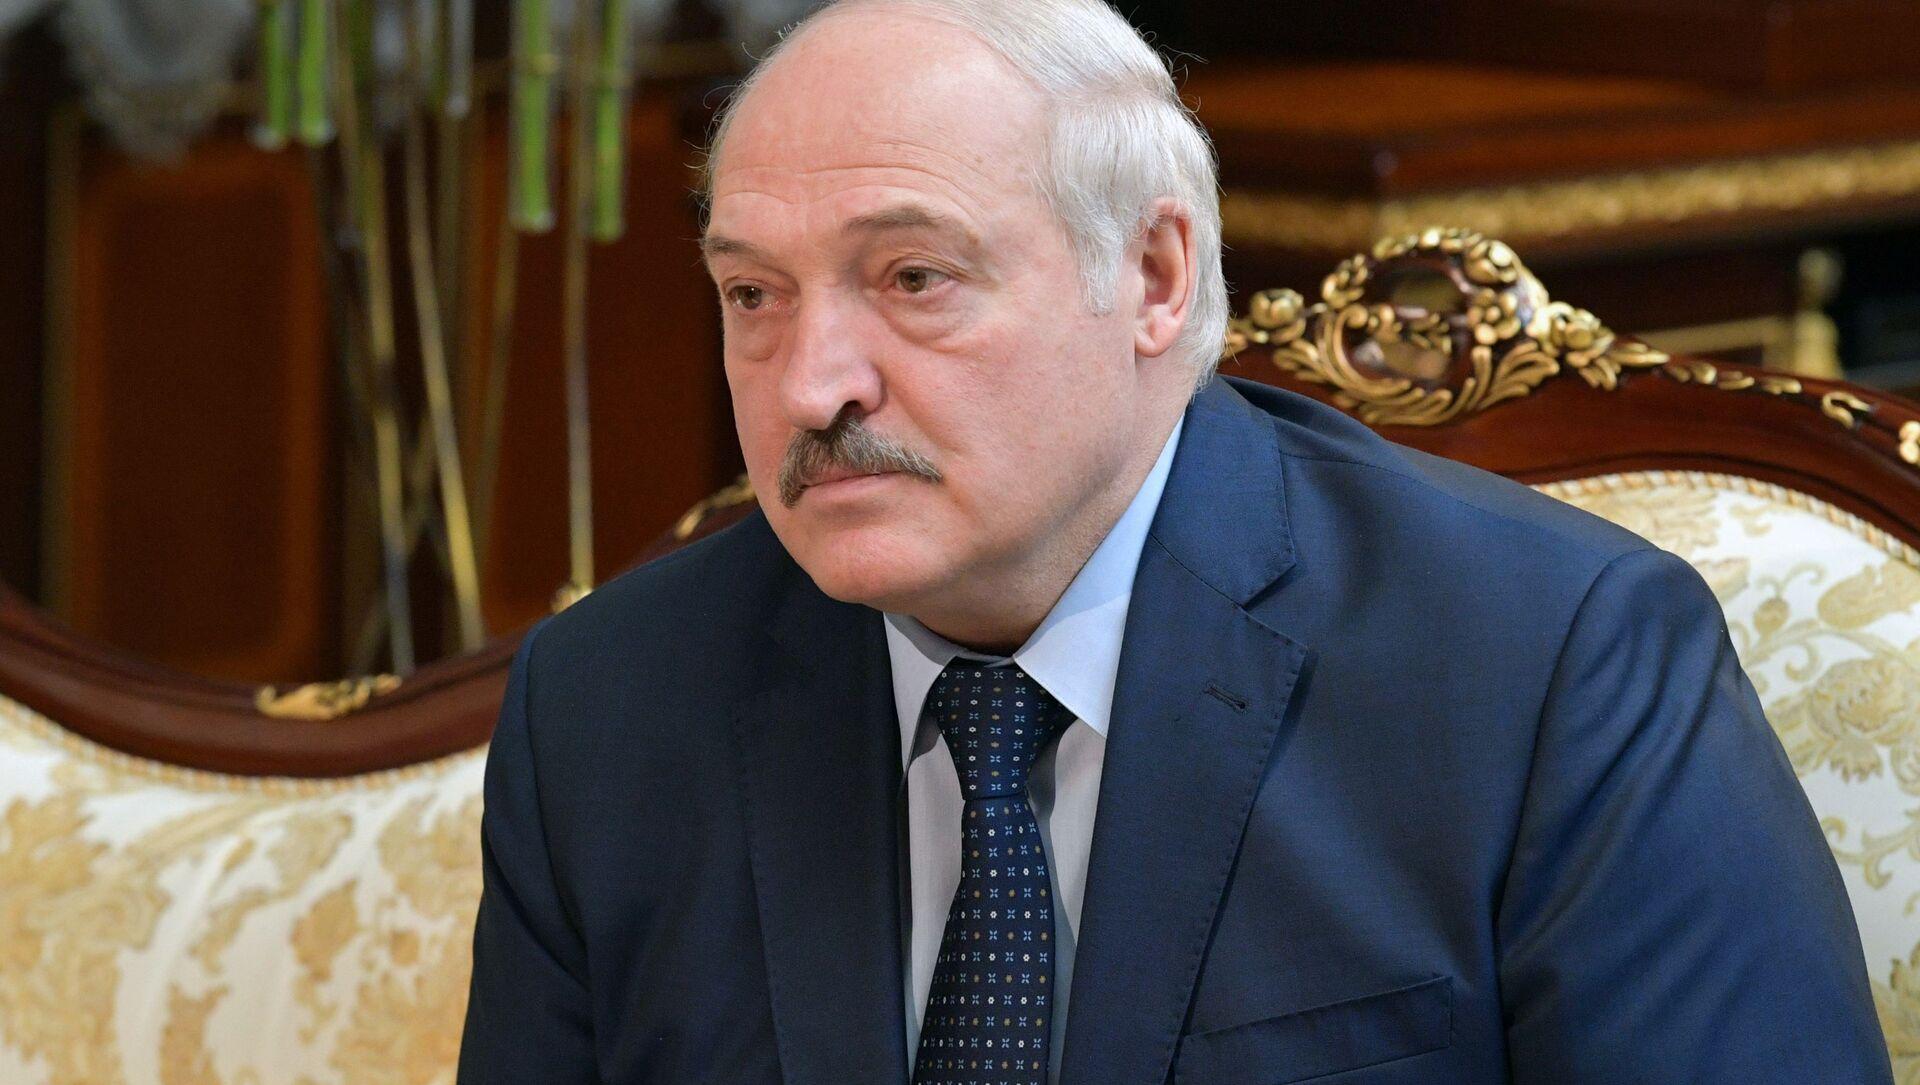 Tổng thống Belarus Alexander Lukashenko. - Sputnik Việt Nam, 1920, 03.07.2021